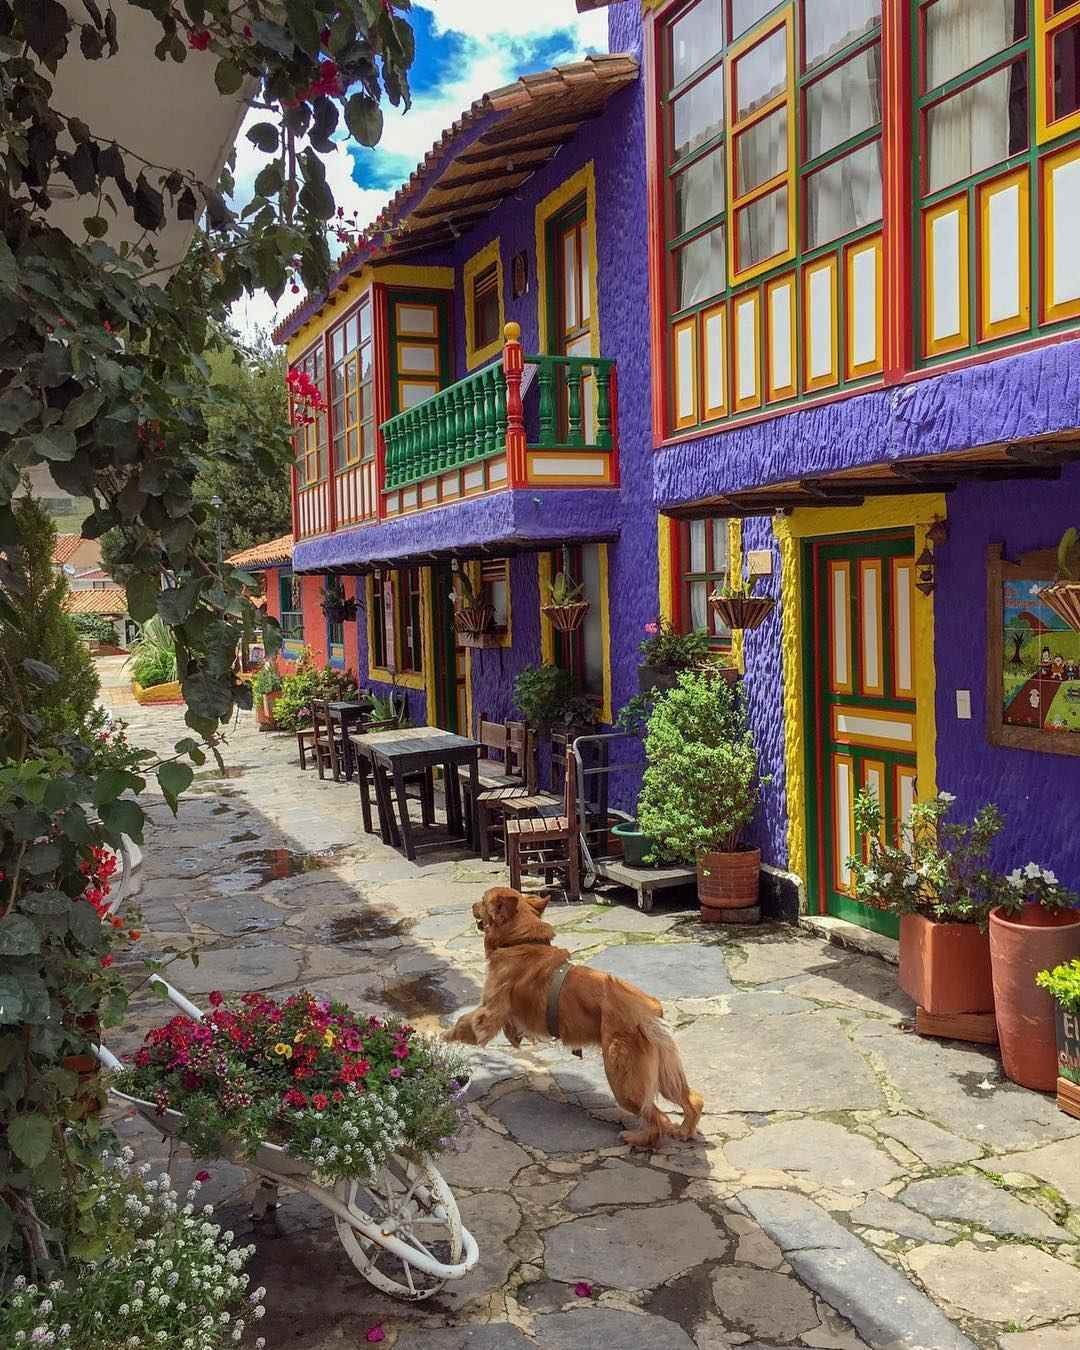 Small towns of Boyacá